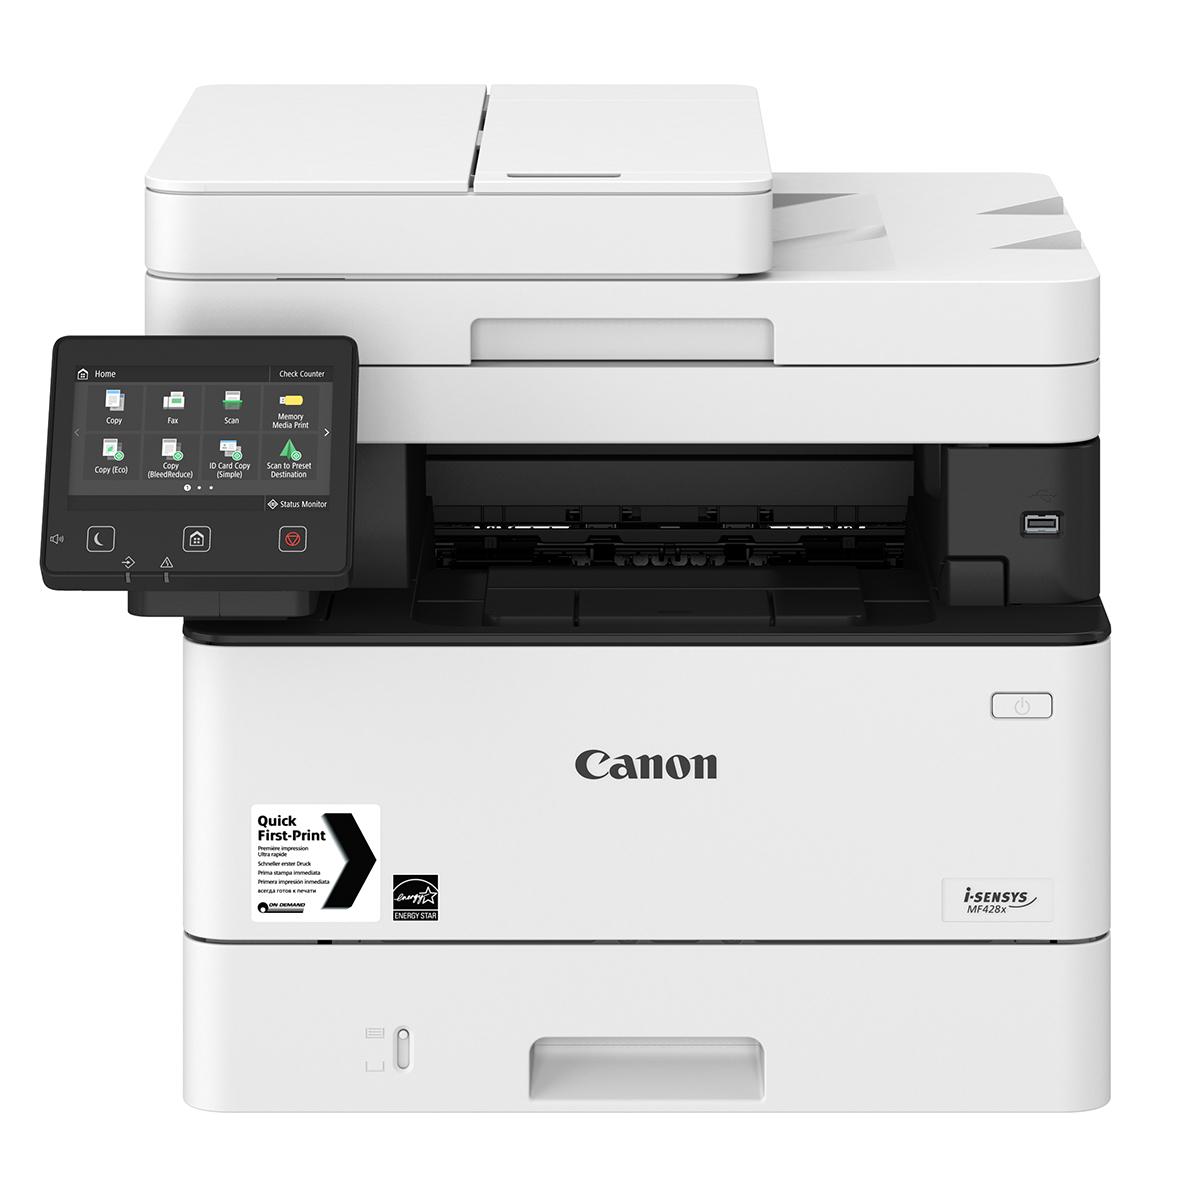 Canon i-SENSYS MF428x Mono Laser Multifunction